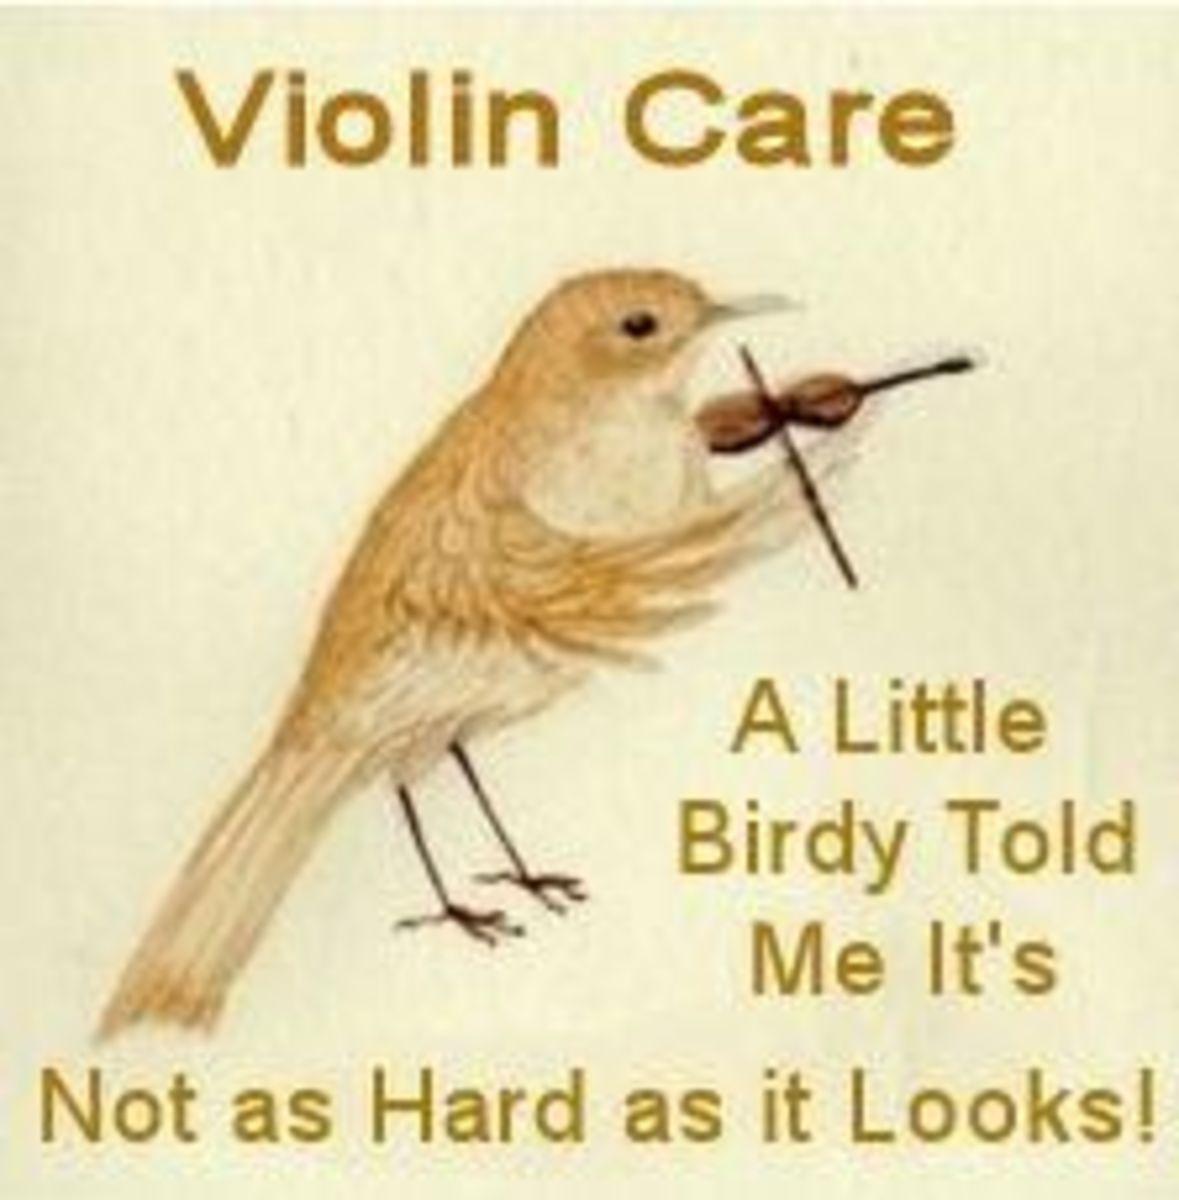 violintips